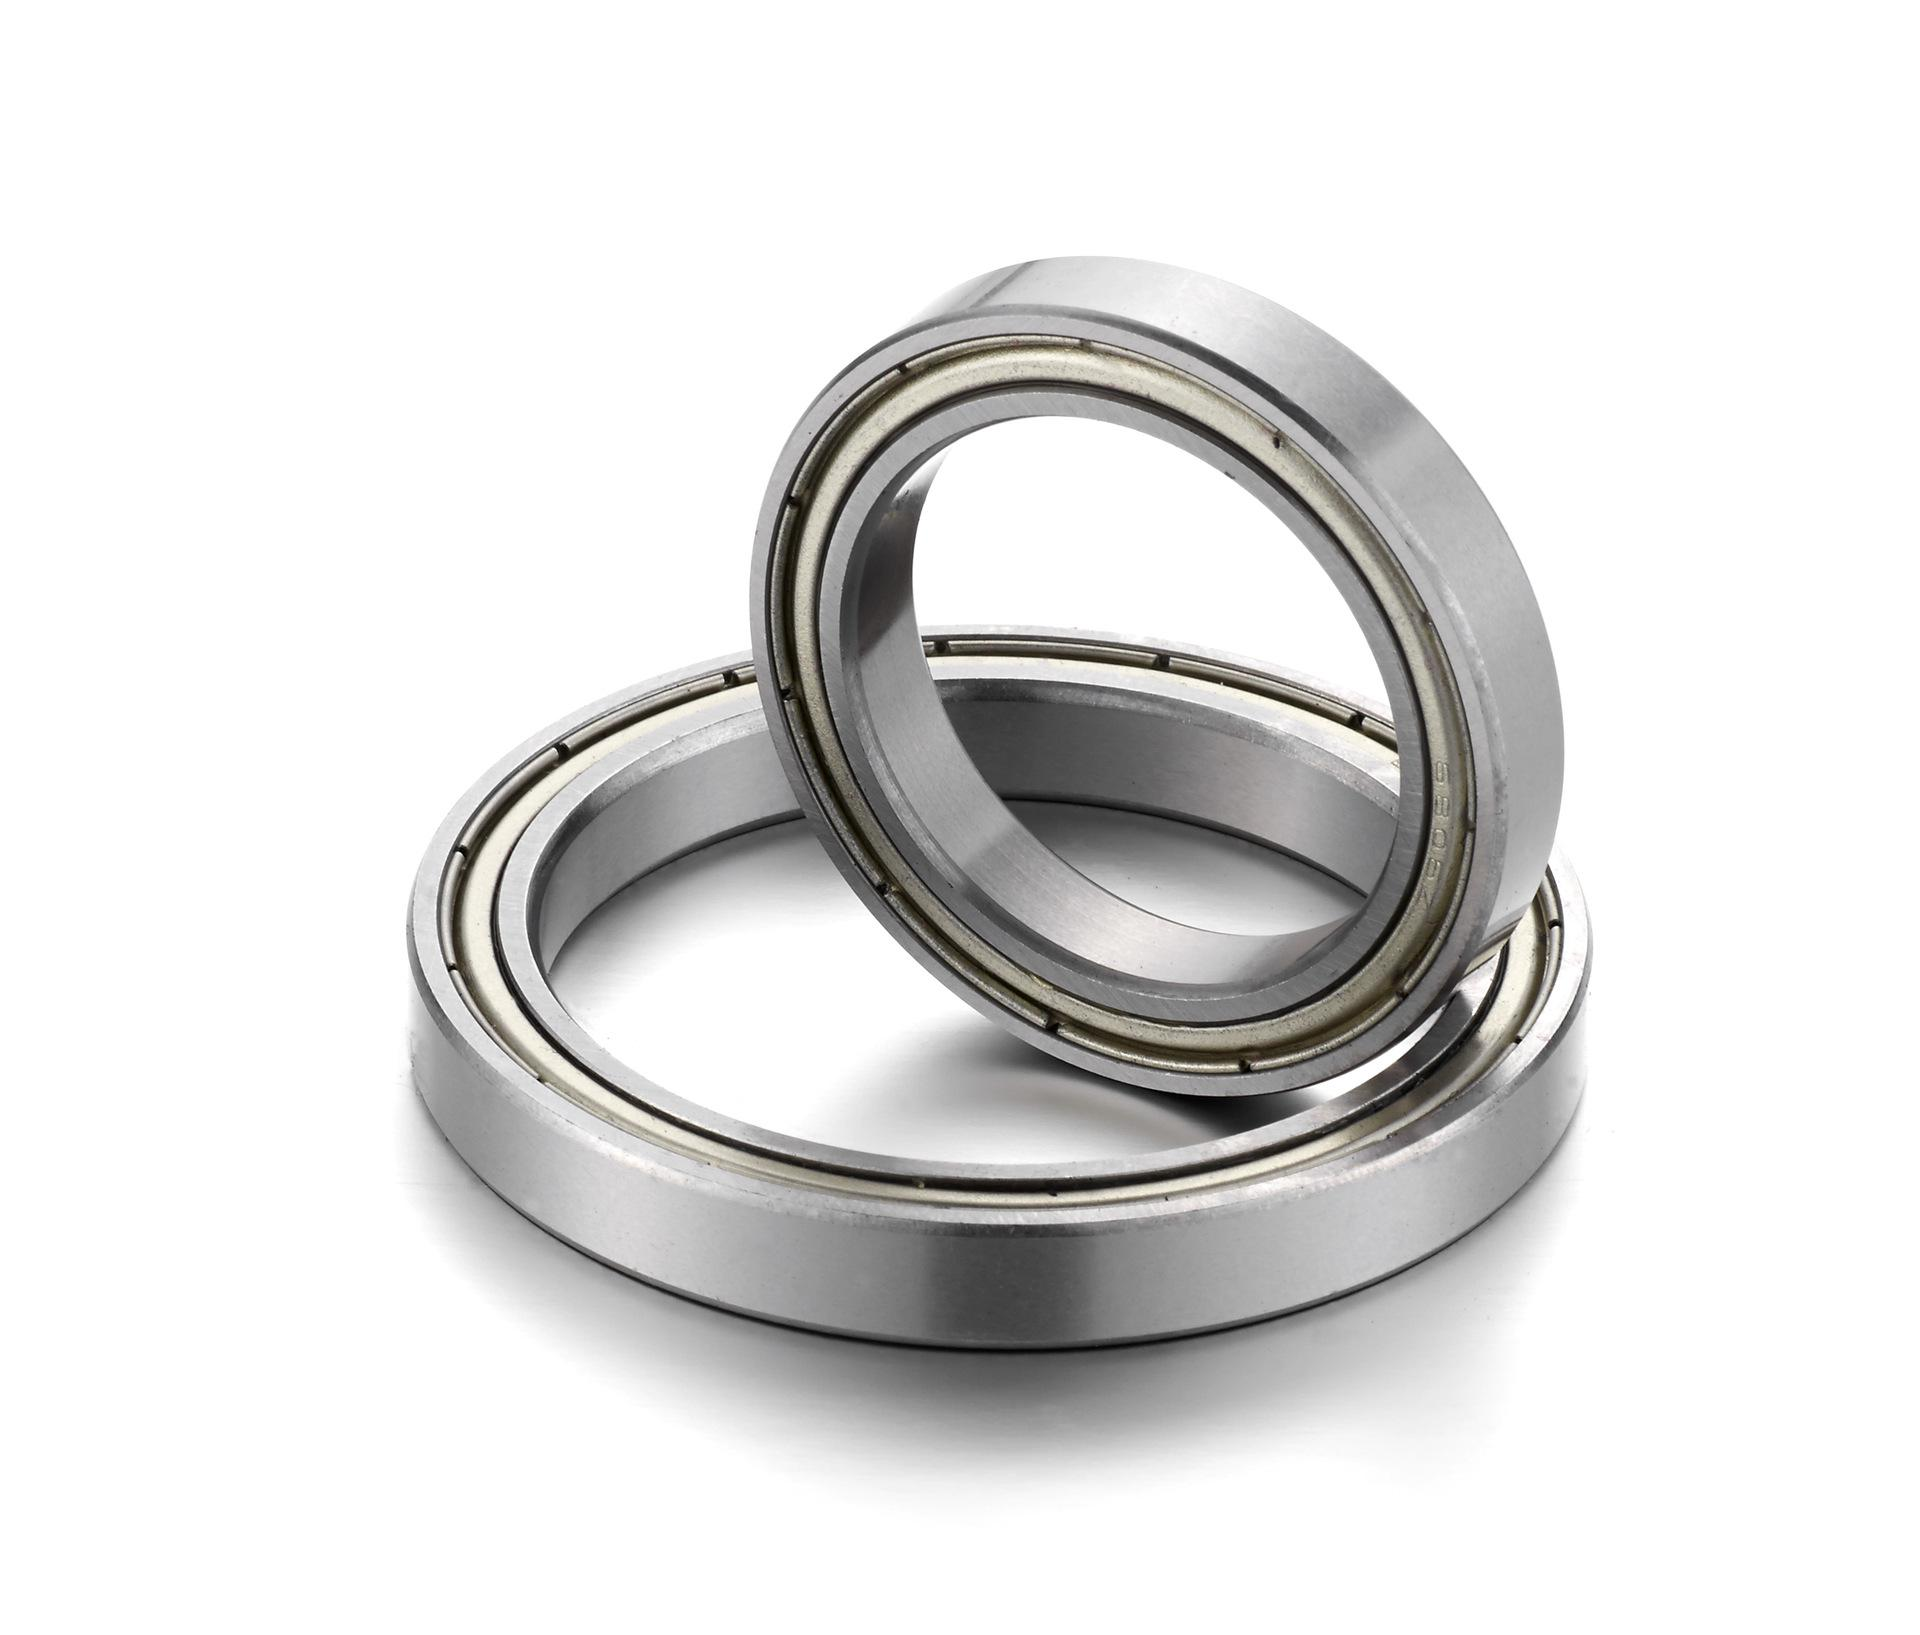 6918 ZZ ABEC-1  90x125x18mm  Metric Thin Section Bearings 61918ZZ 6918ZZ 1pcs 71822 71822cd p4 7822 110x140x16 mochu thin walled miniature angular contact bearings speed spindle bearings cnc abec 7